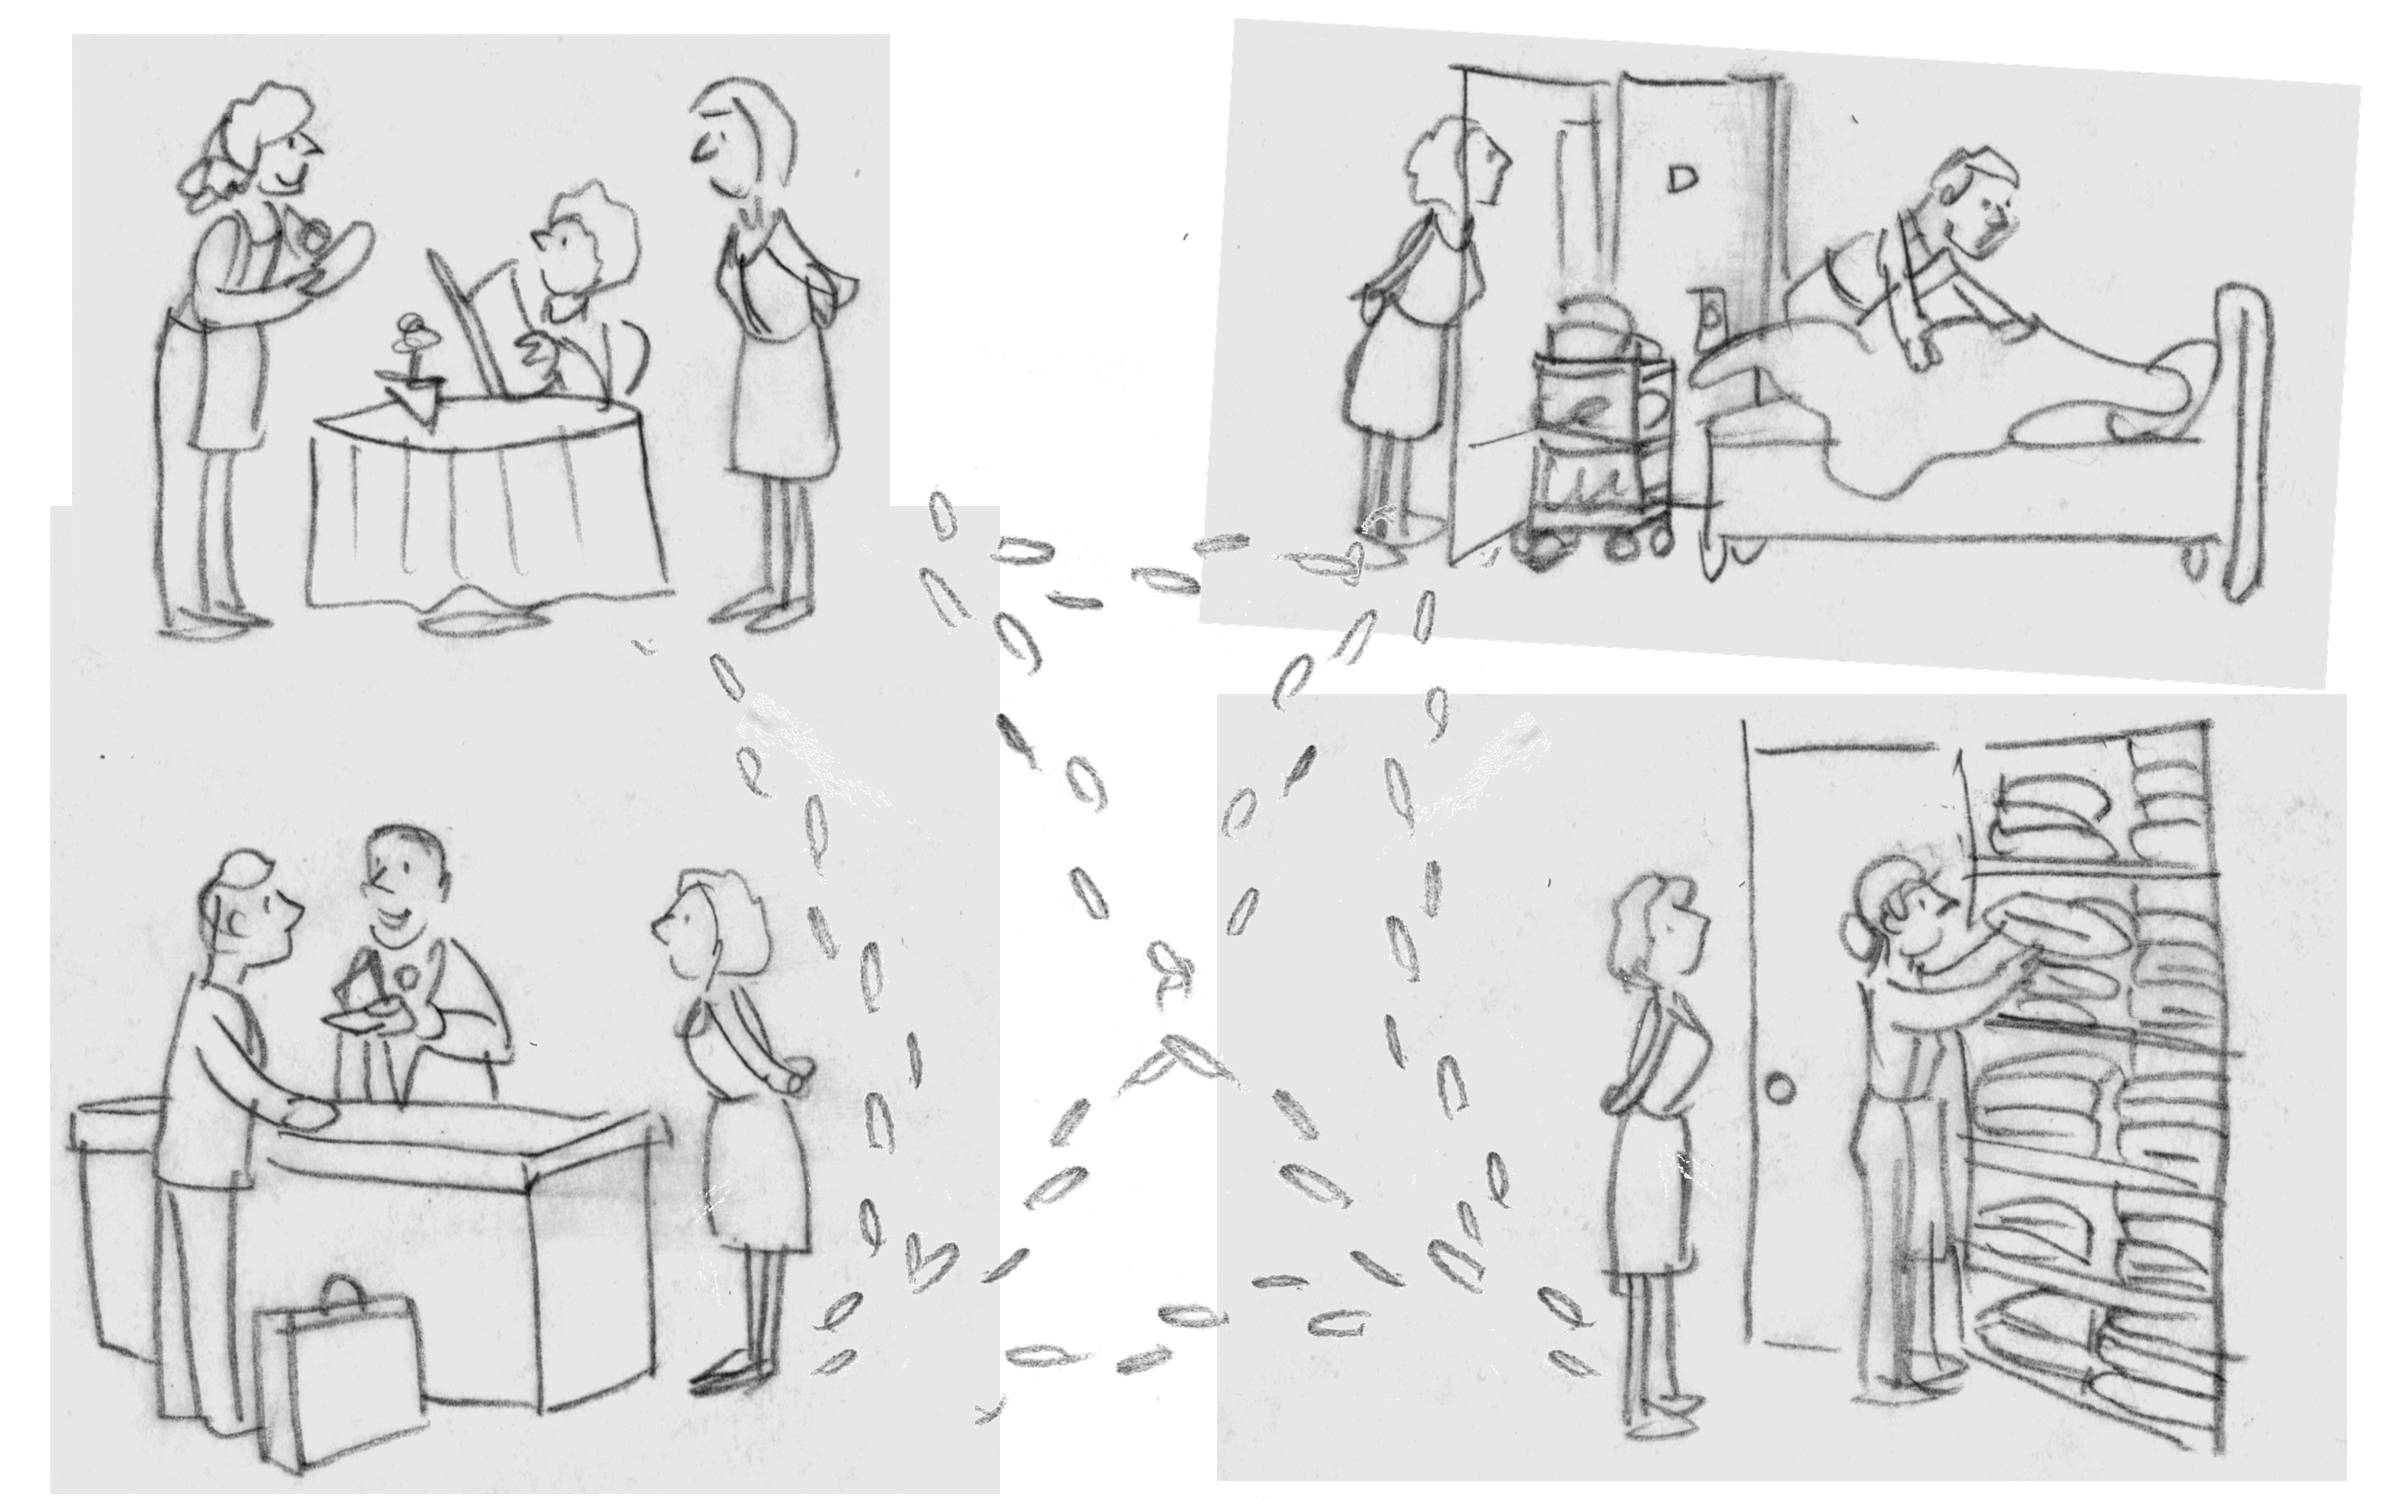 lodging_PreventingOccupationalFraud_sk1